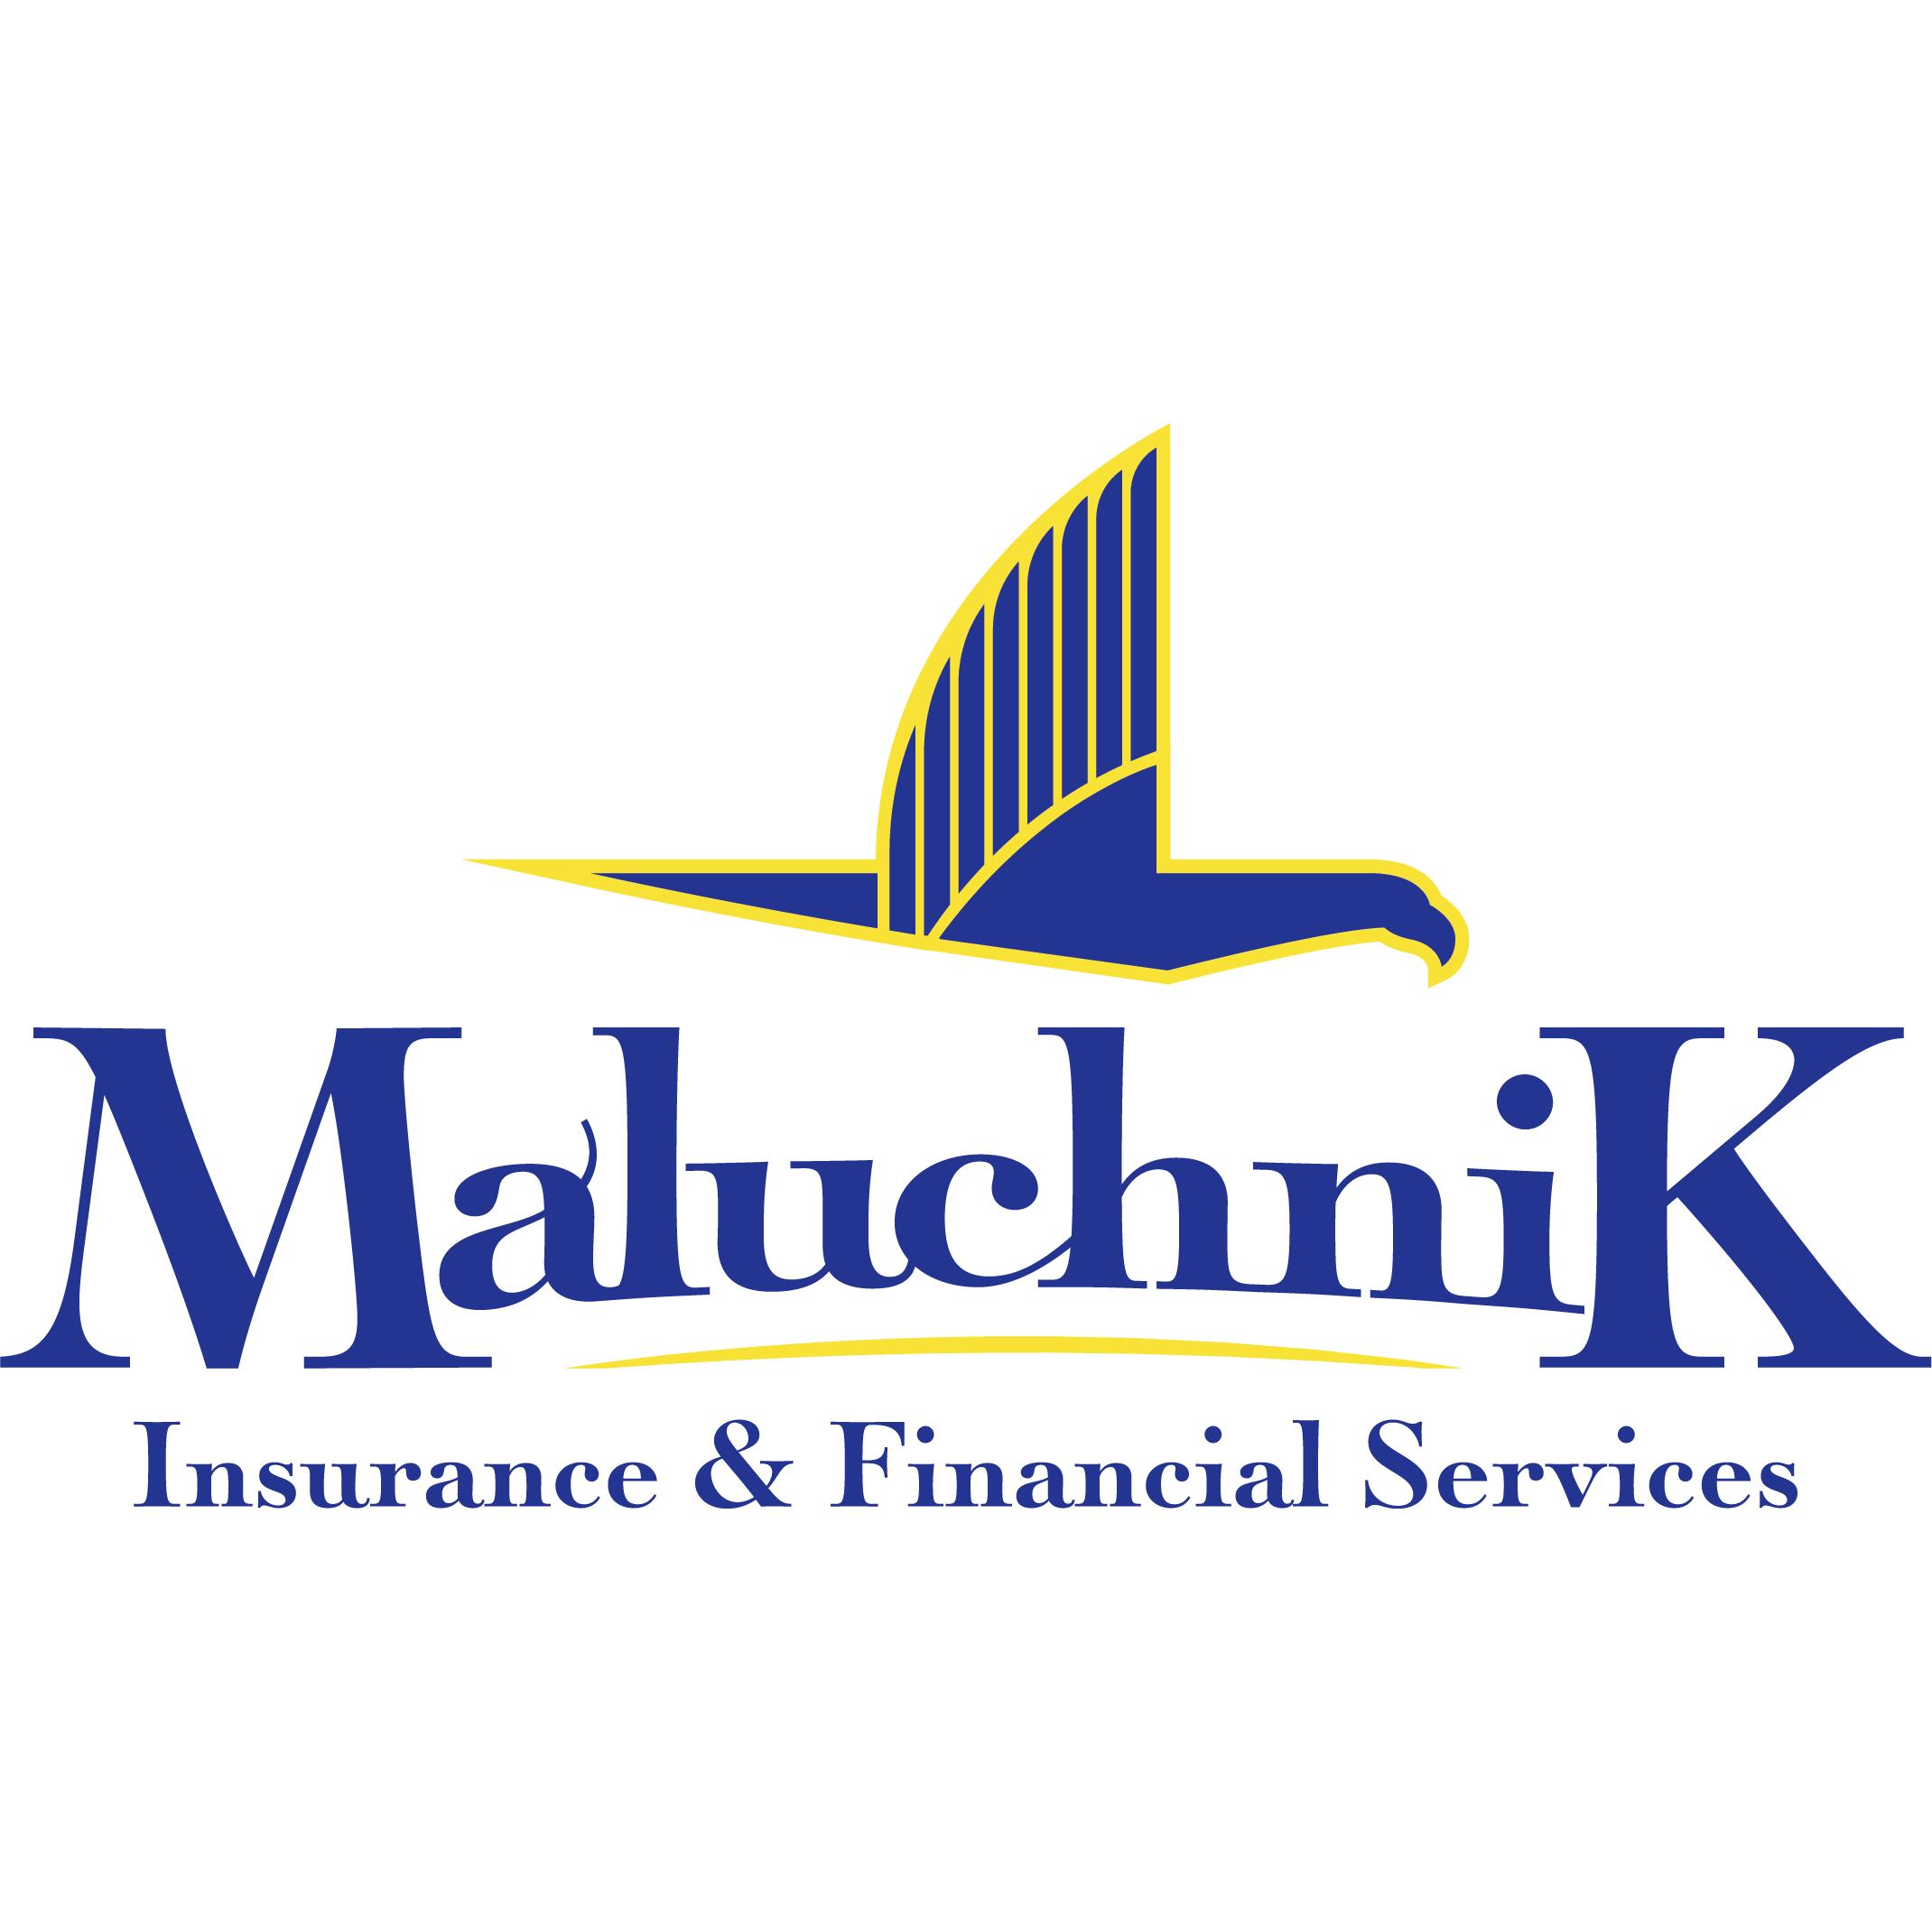 Maluchnik Insurance & Financial Services - Nationwide Insurance